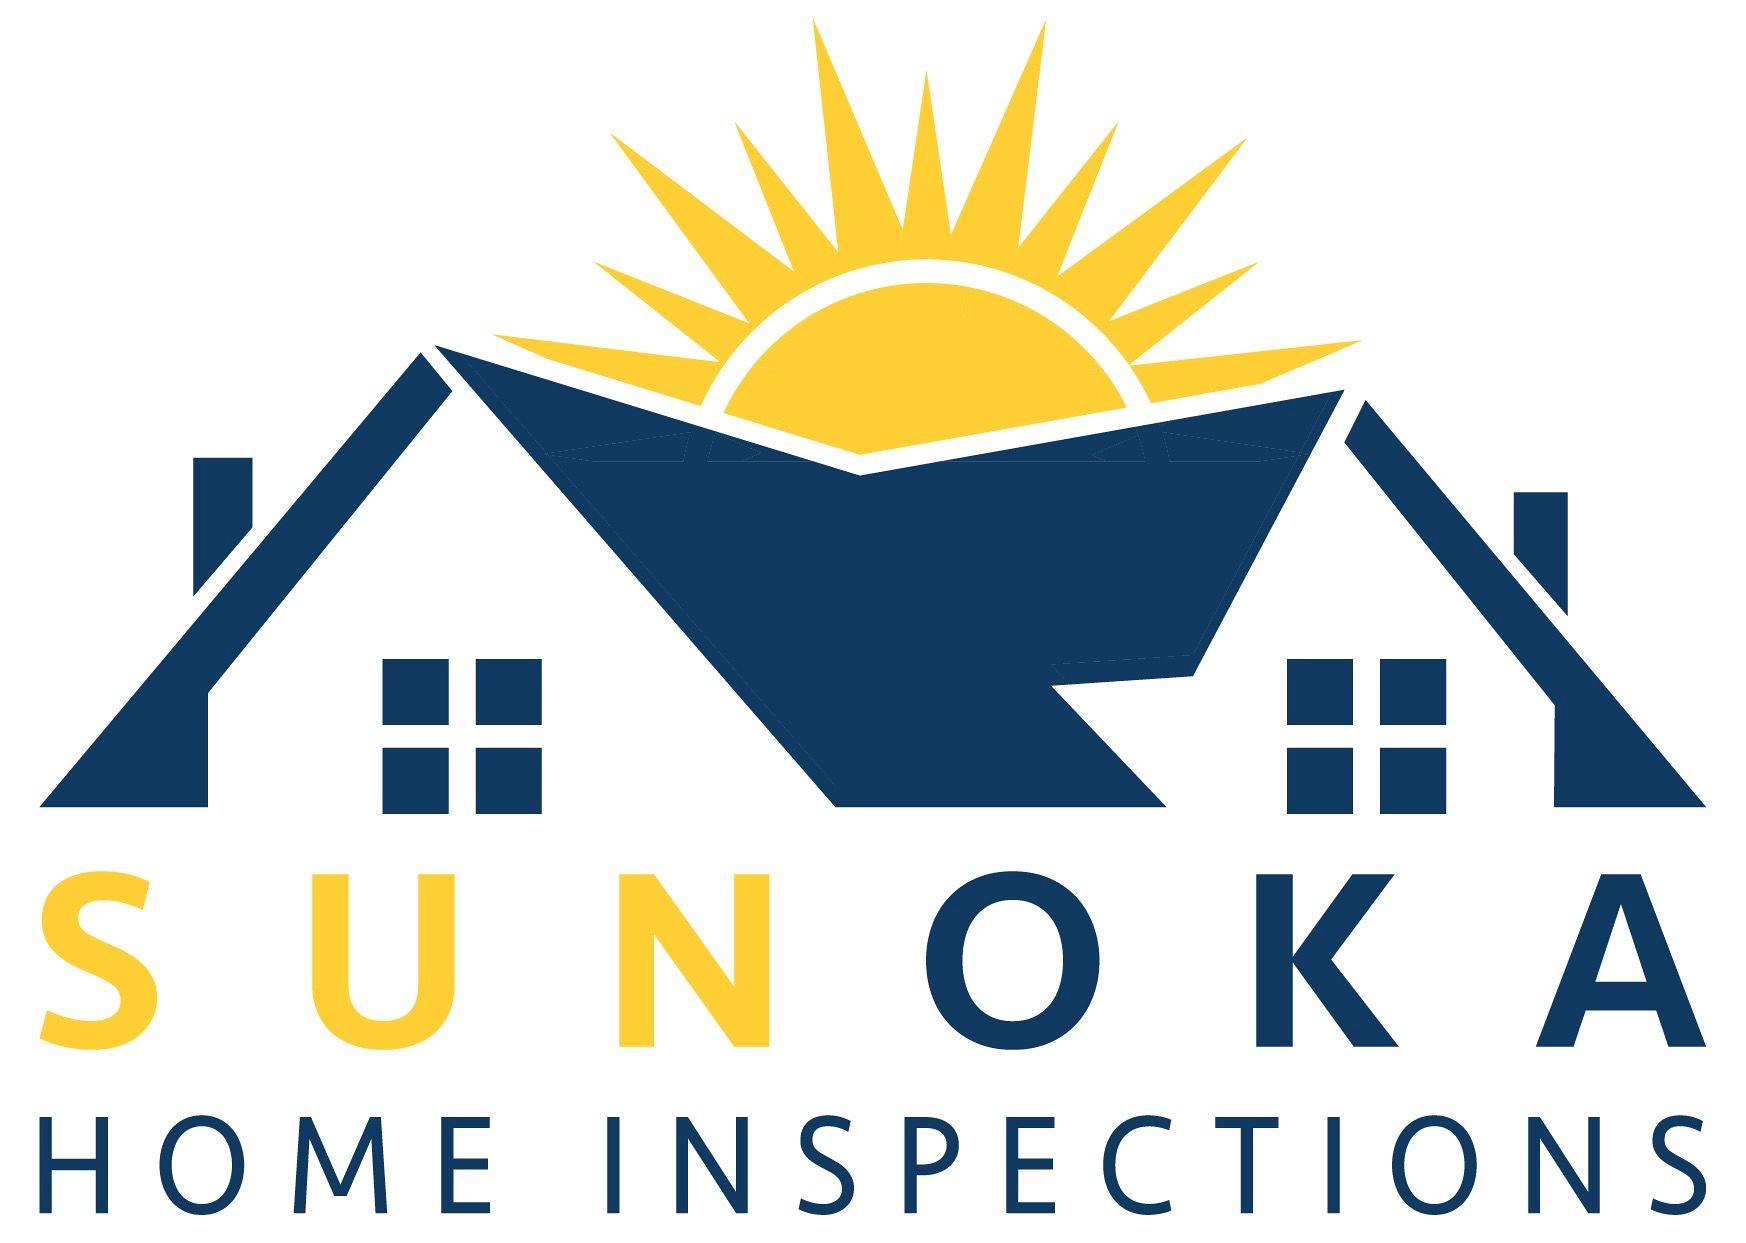 SunOka Home Inspections